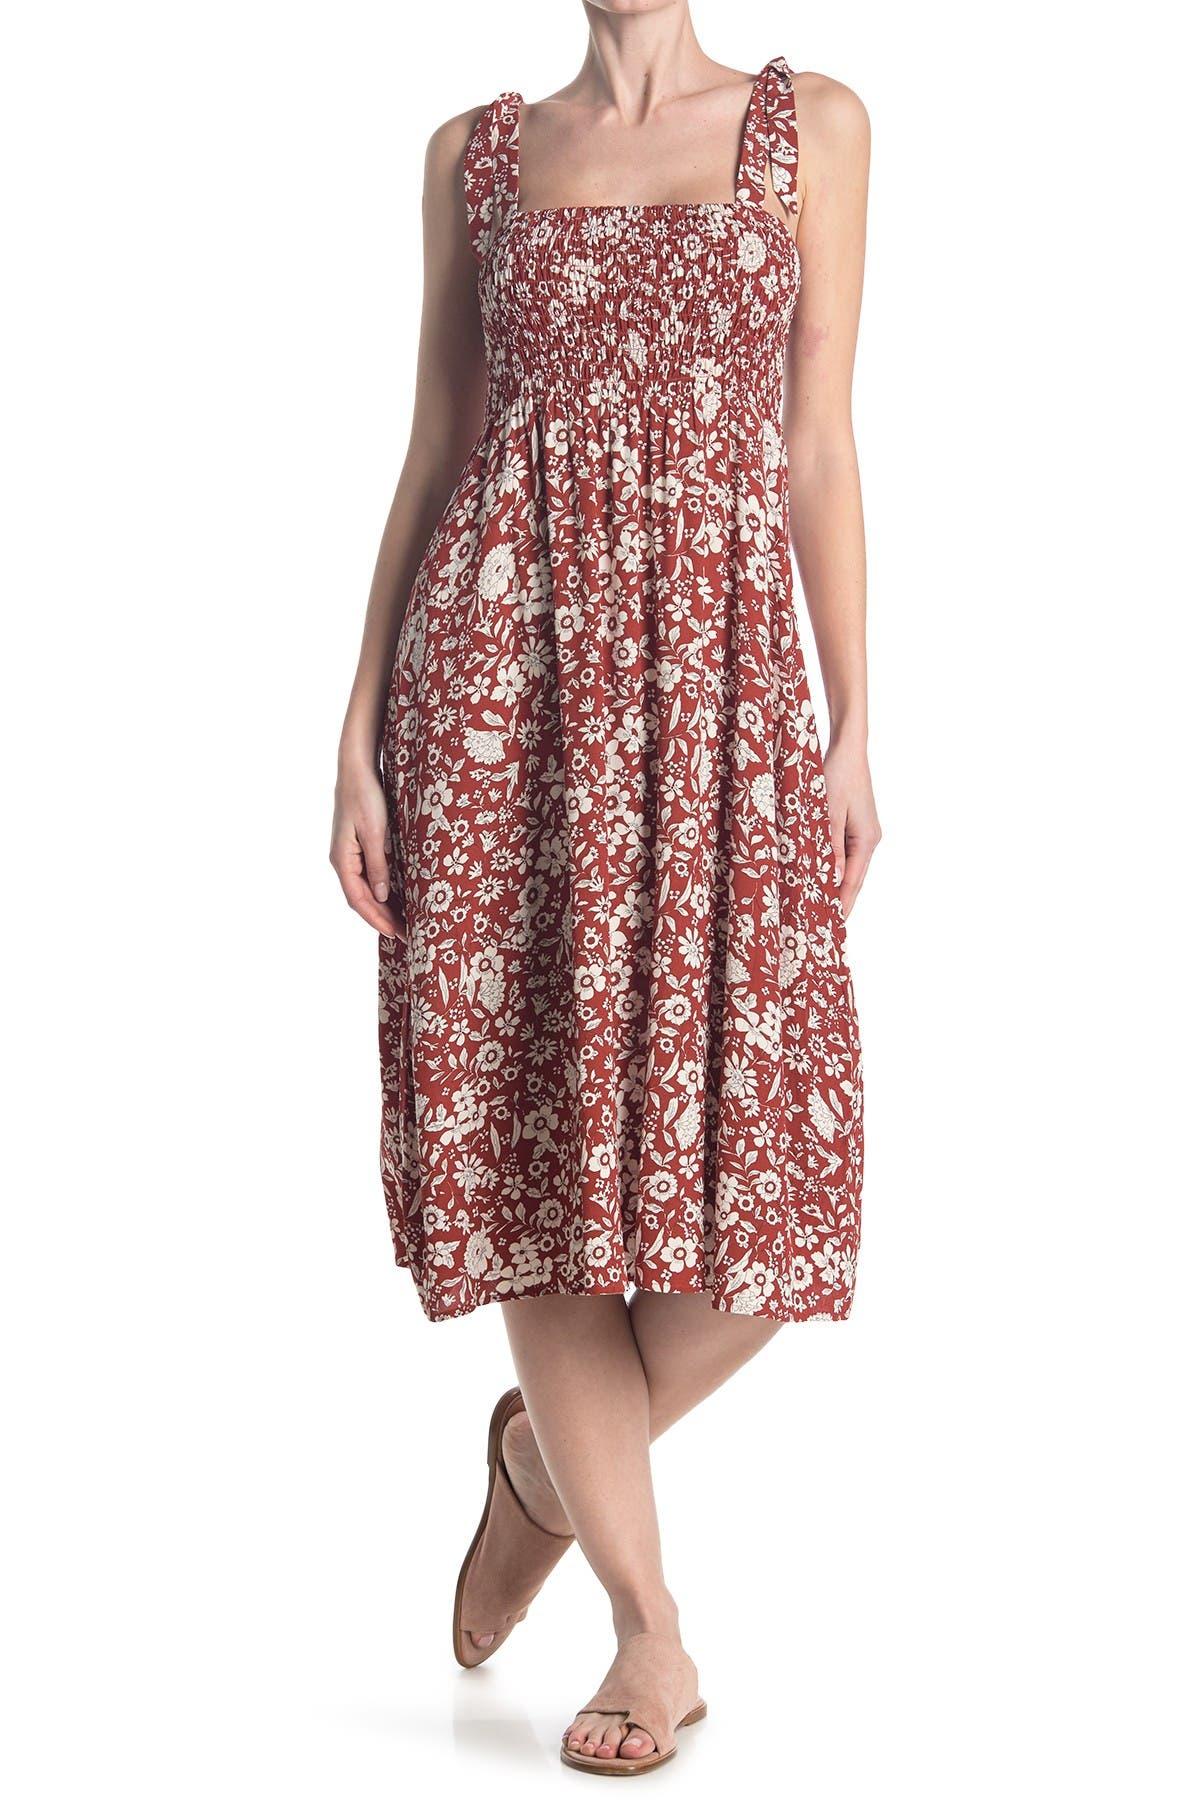 Image of Sanctuary Wine Tasting Floral Smocked Maxi Dress